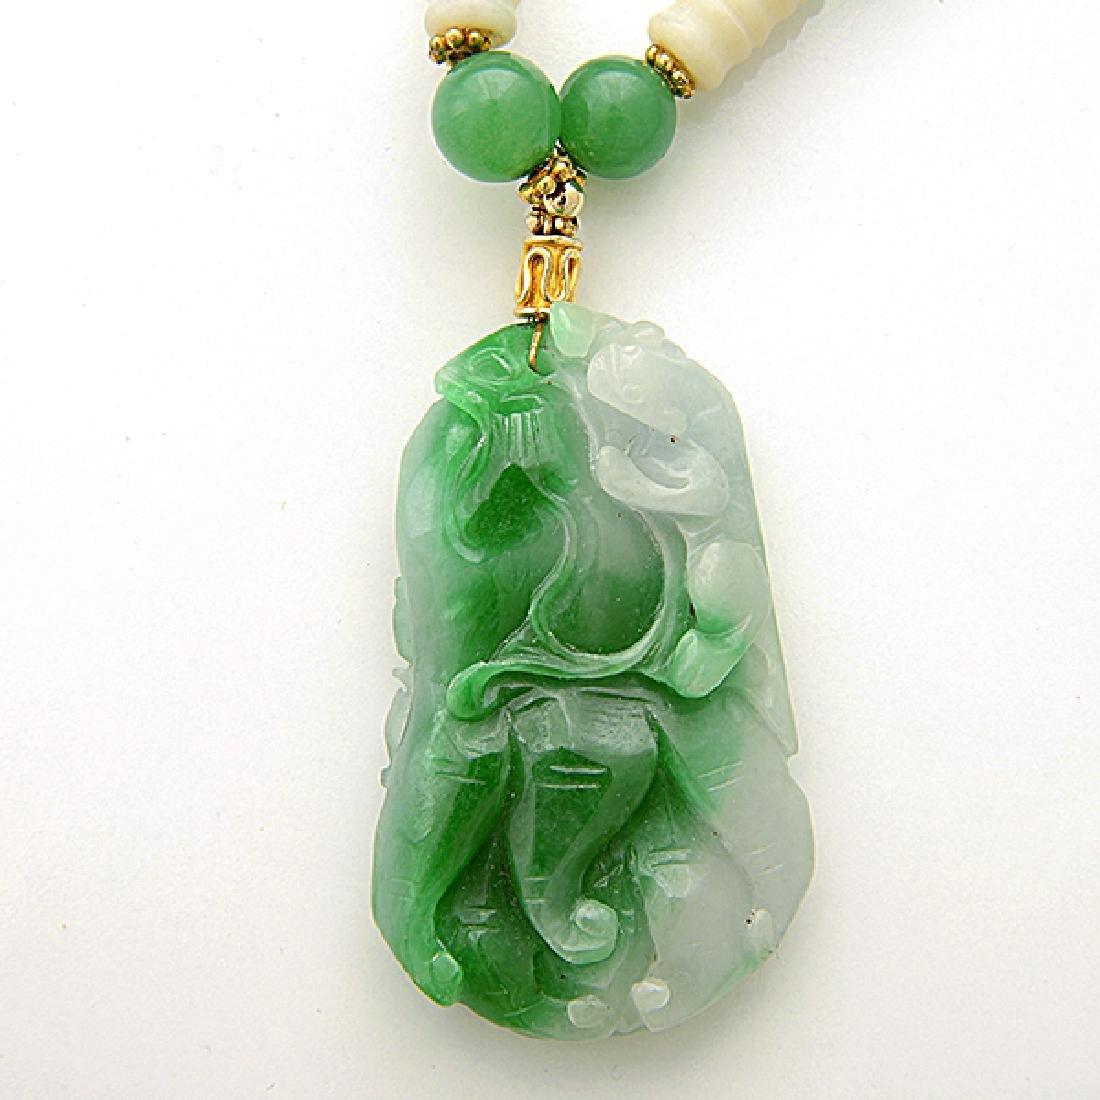 Jade, Quench Crackled Quartz, Vermeil Necklace. - 2